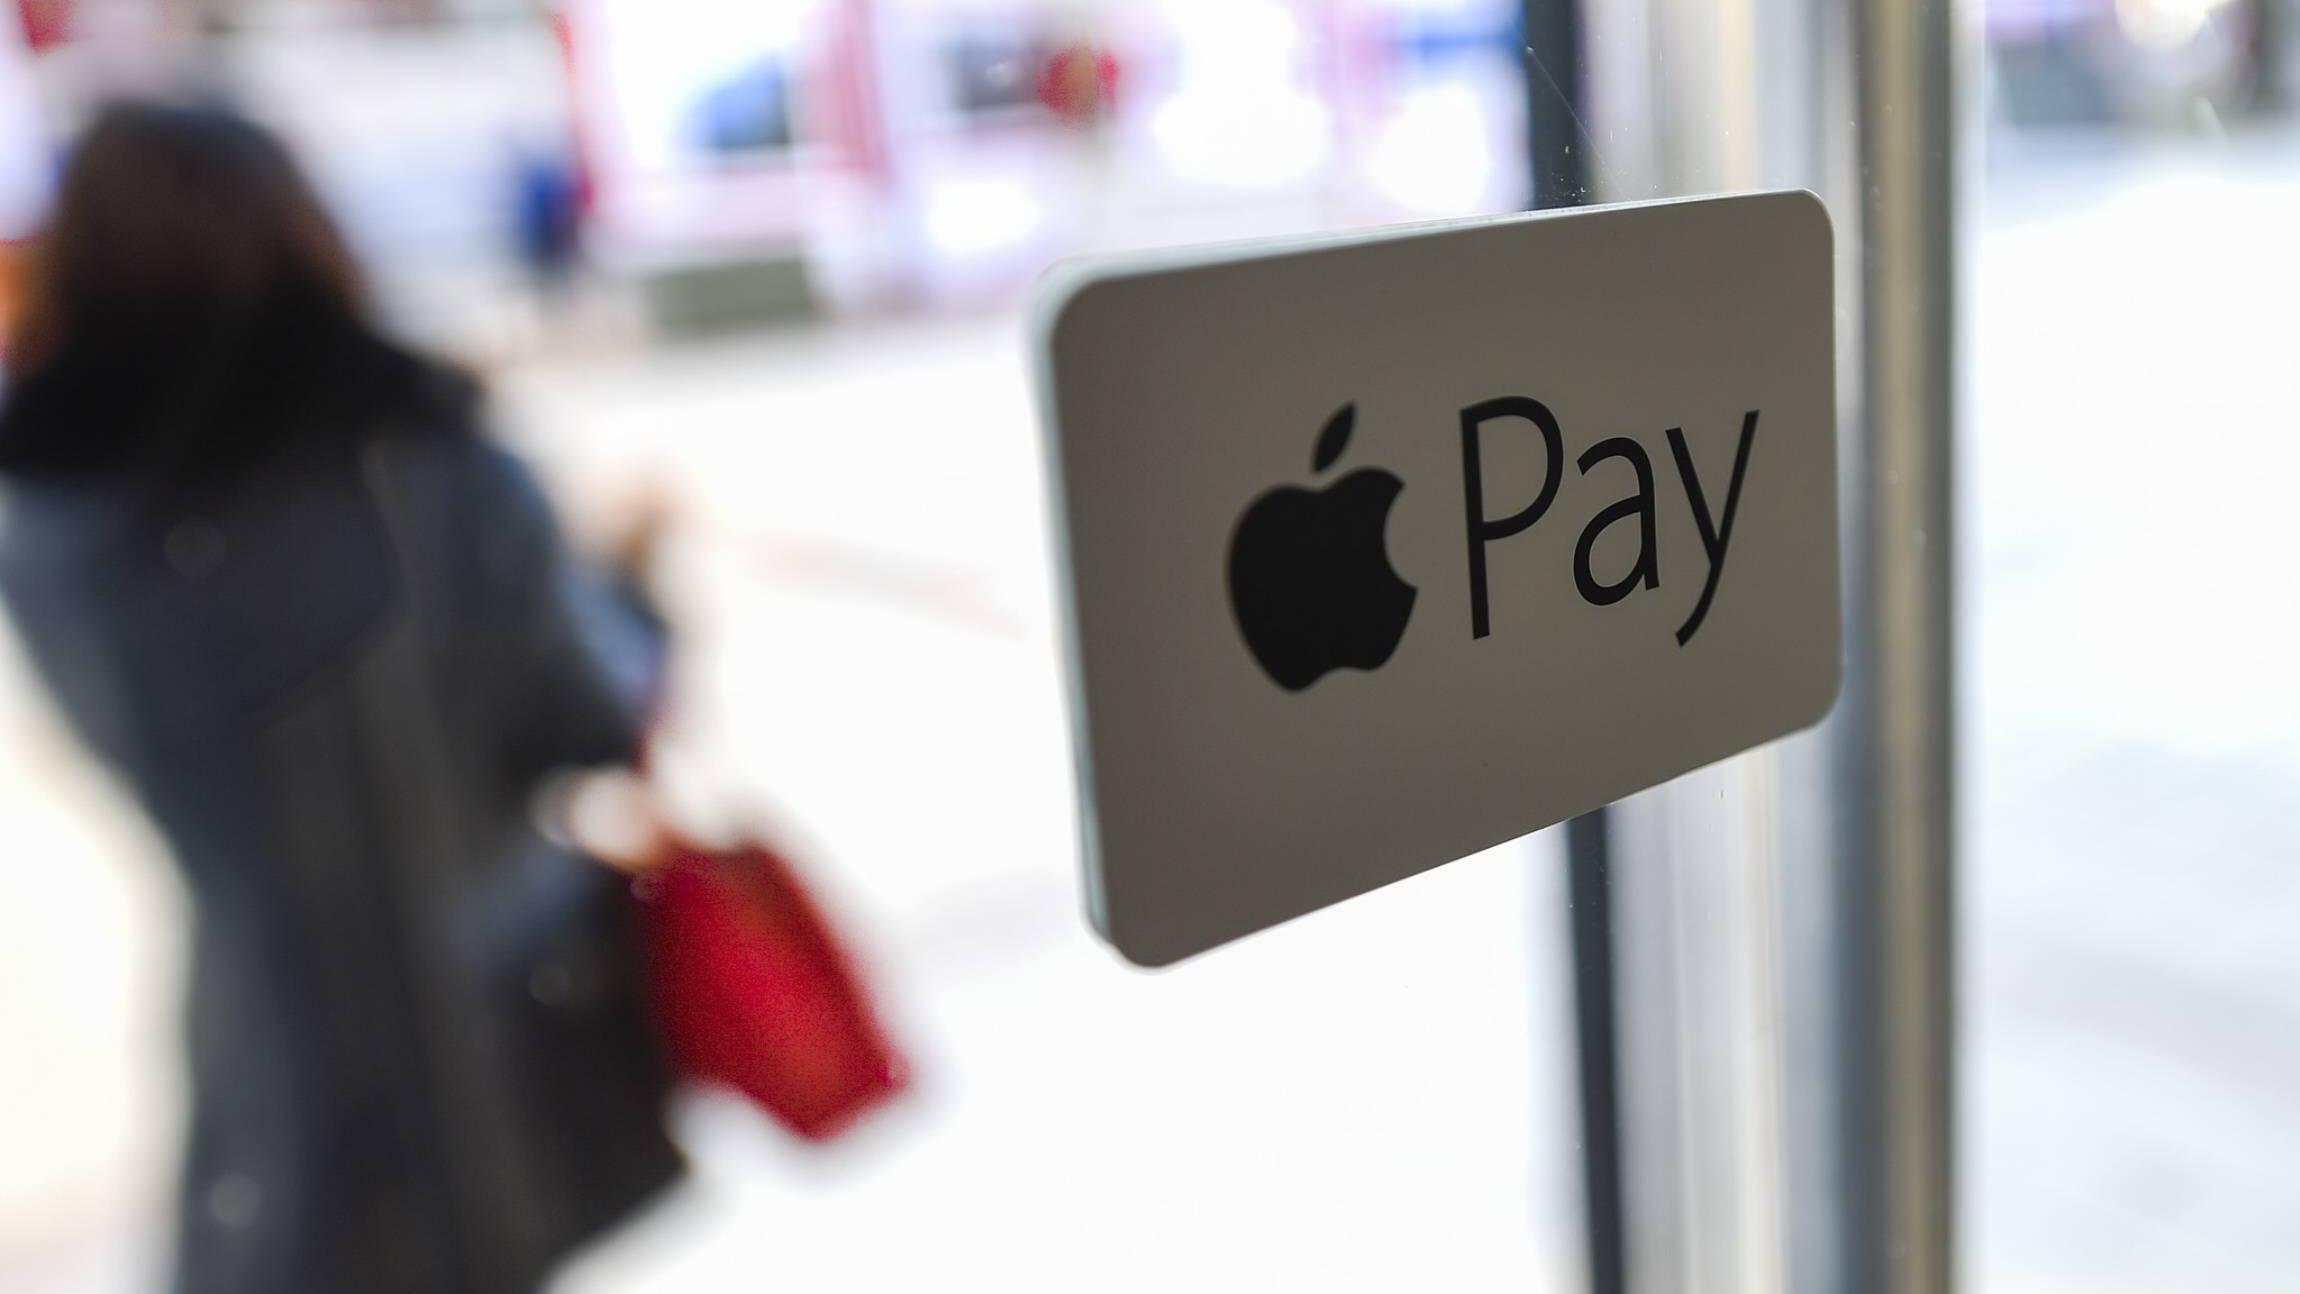 Apple Pay deaktivieren - so geht's